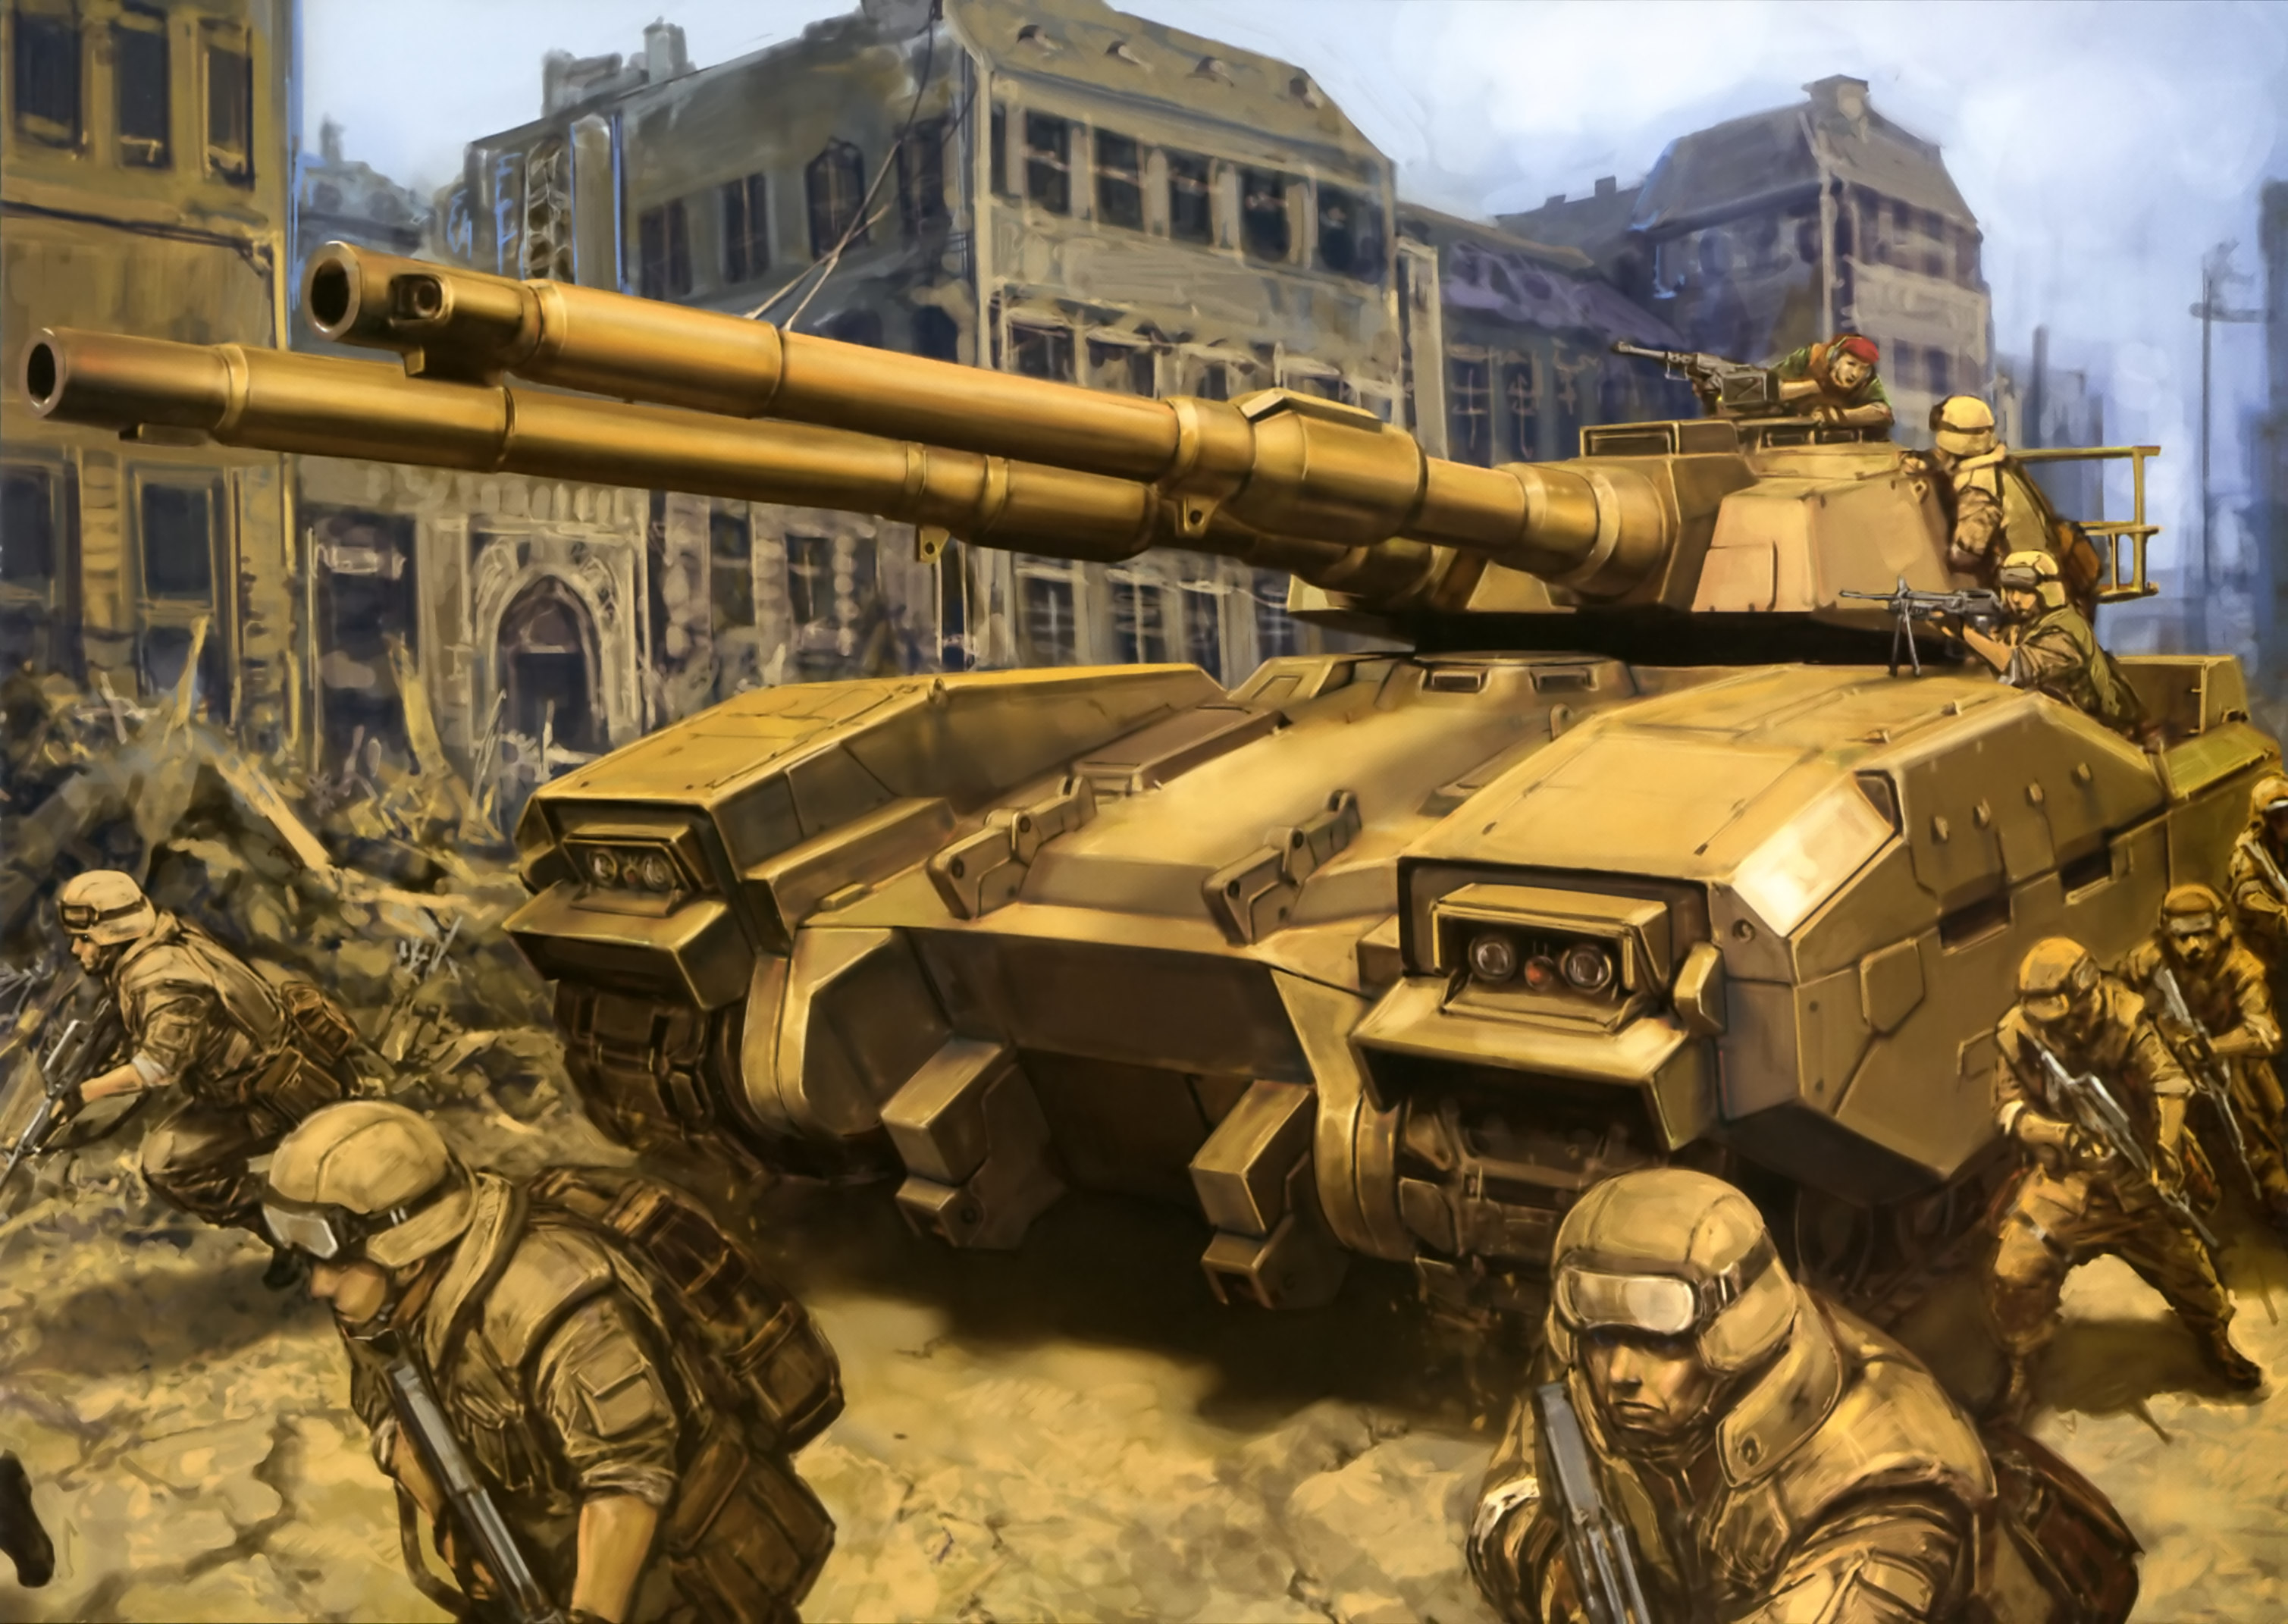 M61A5 Main Battle Tanks VS Baneblade Super Heavy Tanks